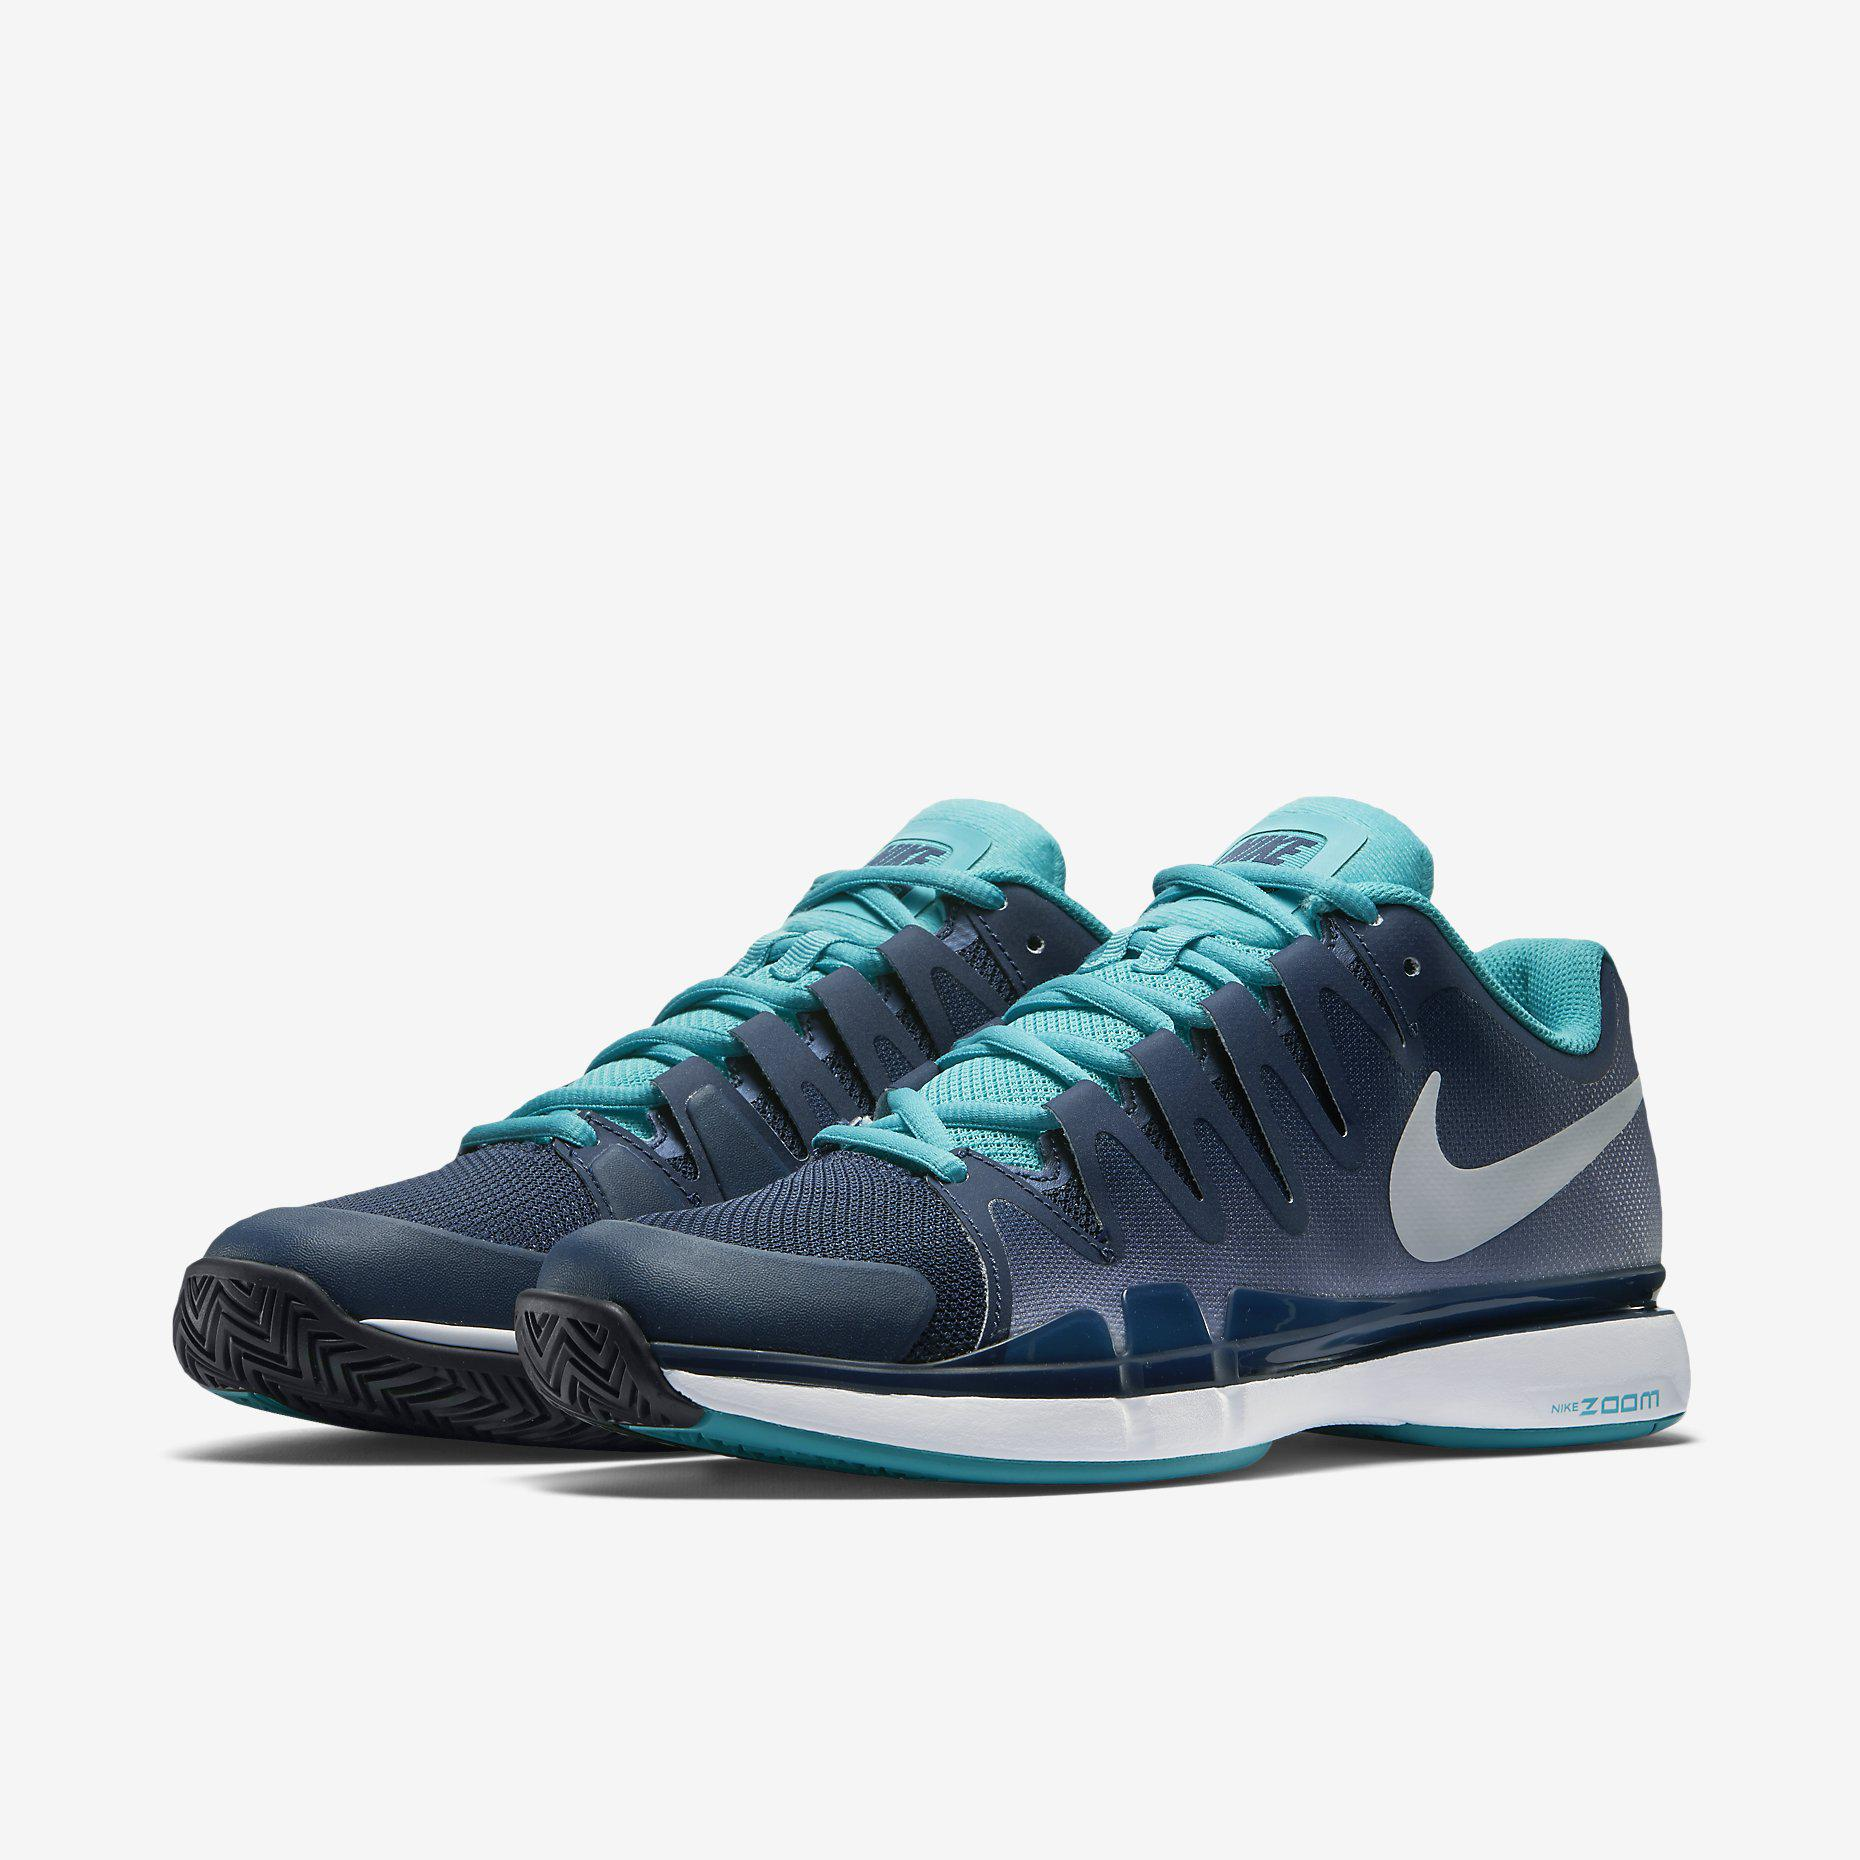 2749905e67ea Nike Mens Zoom Vapor 9.5 Tour Tennis Shoes - Midnight Navy ...